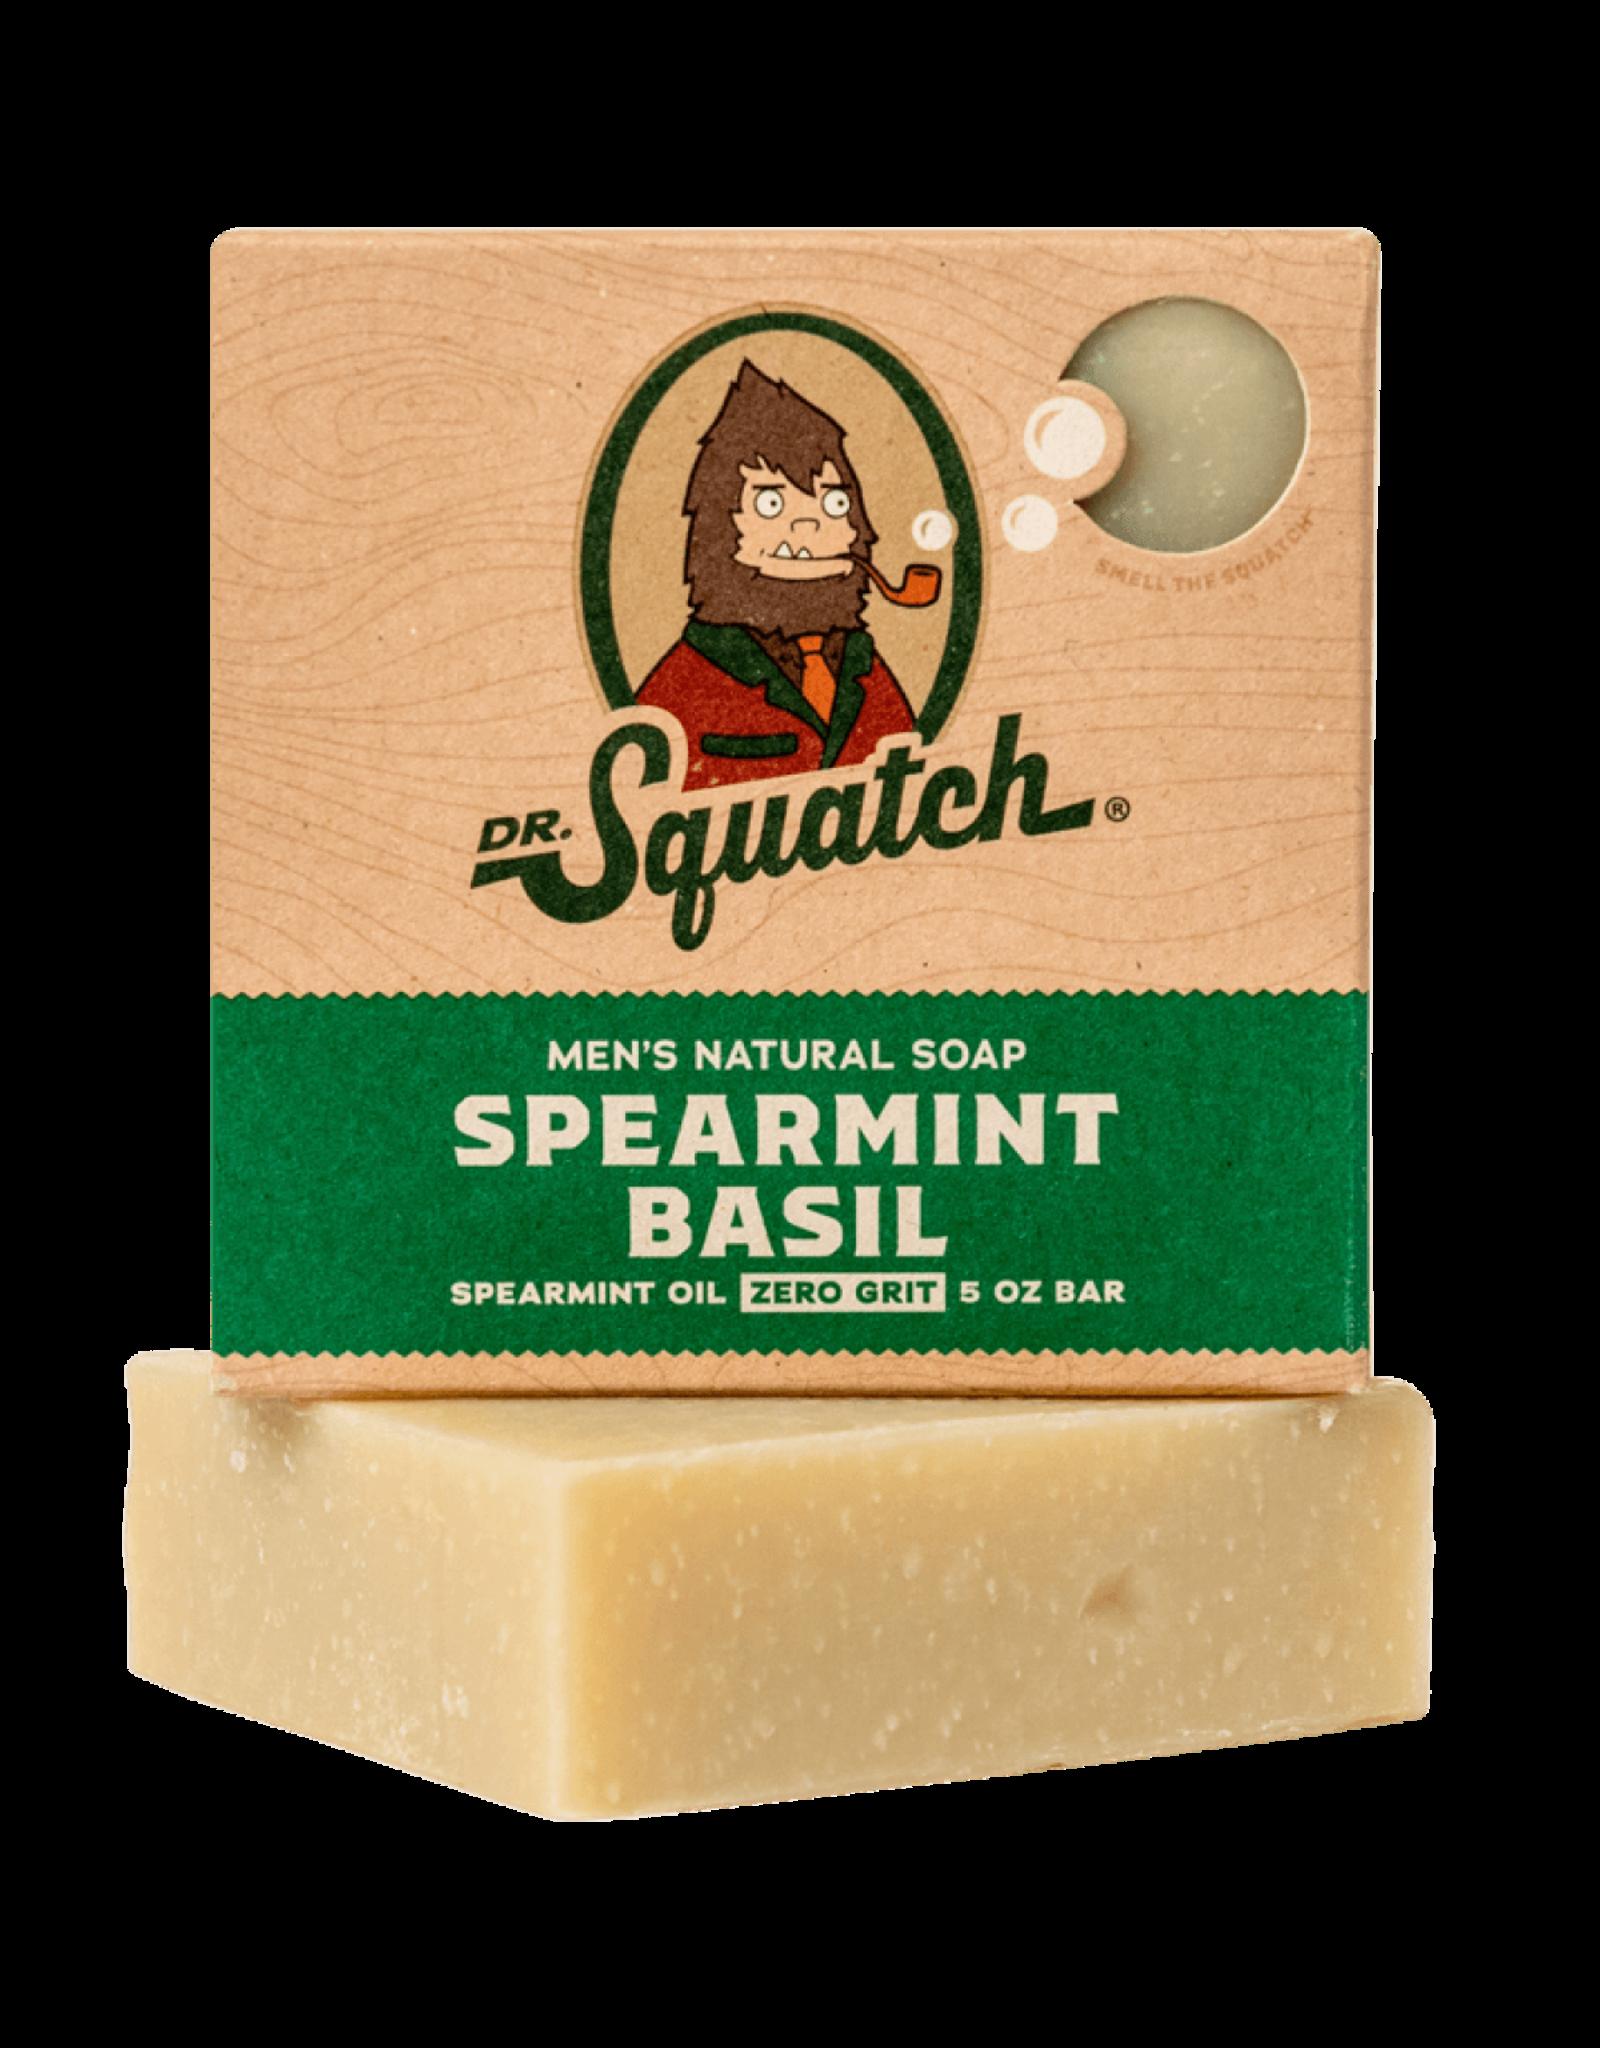 Dr. Squatch Spearmint Basil Scrub Soap